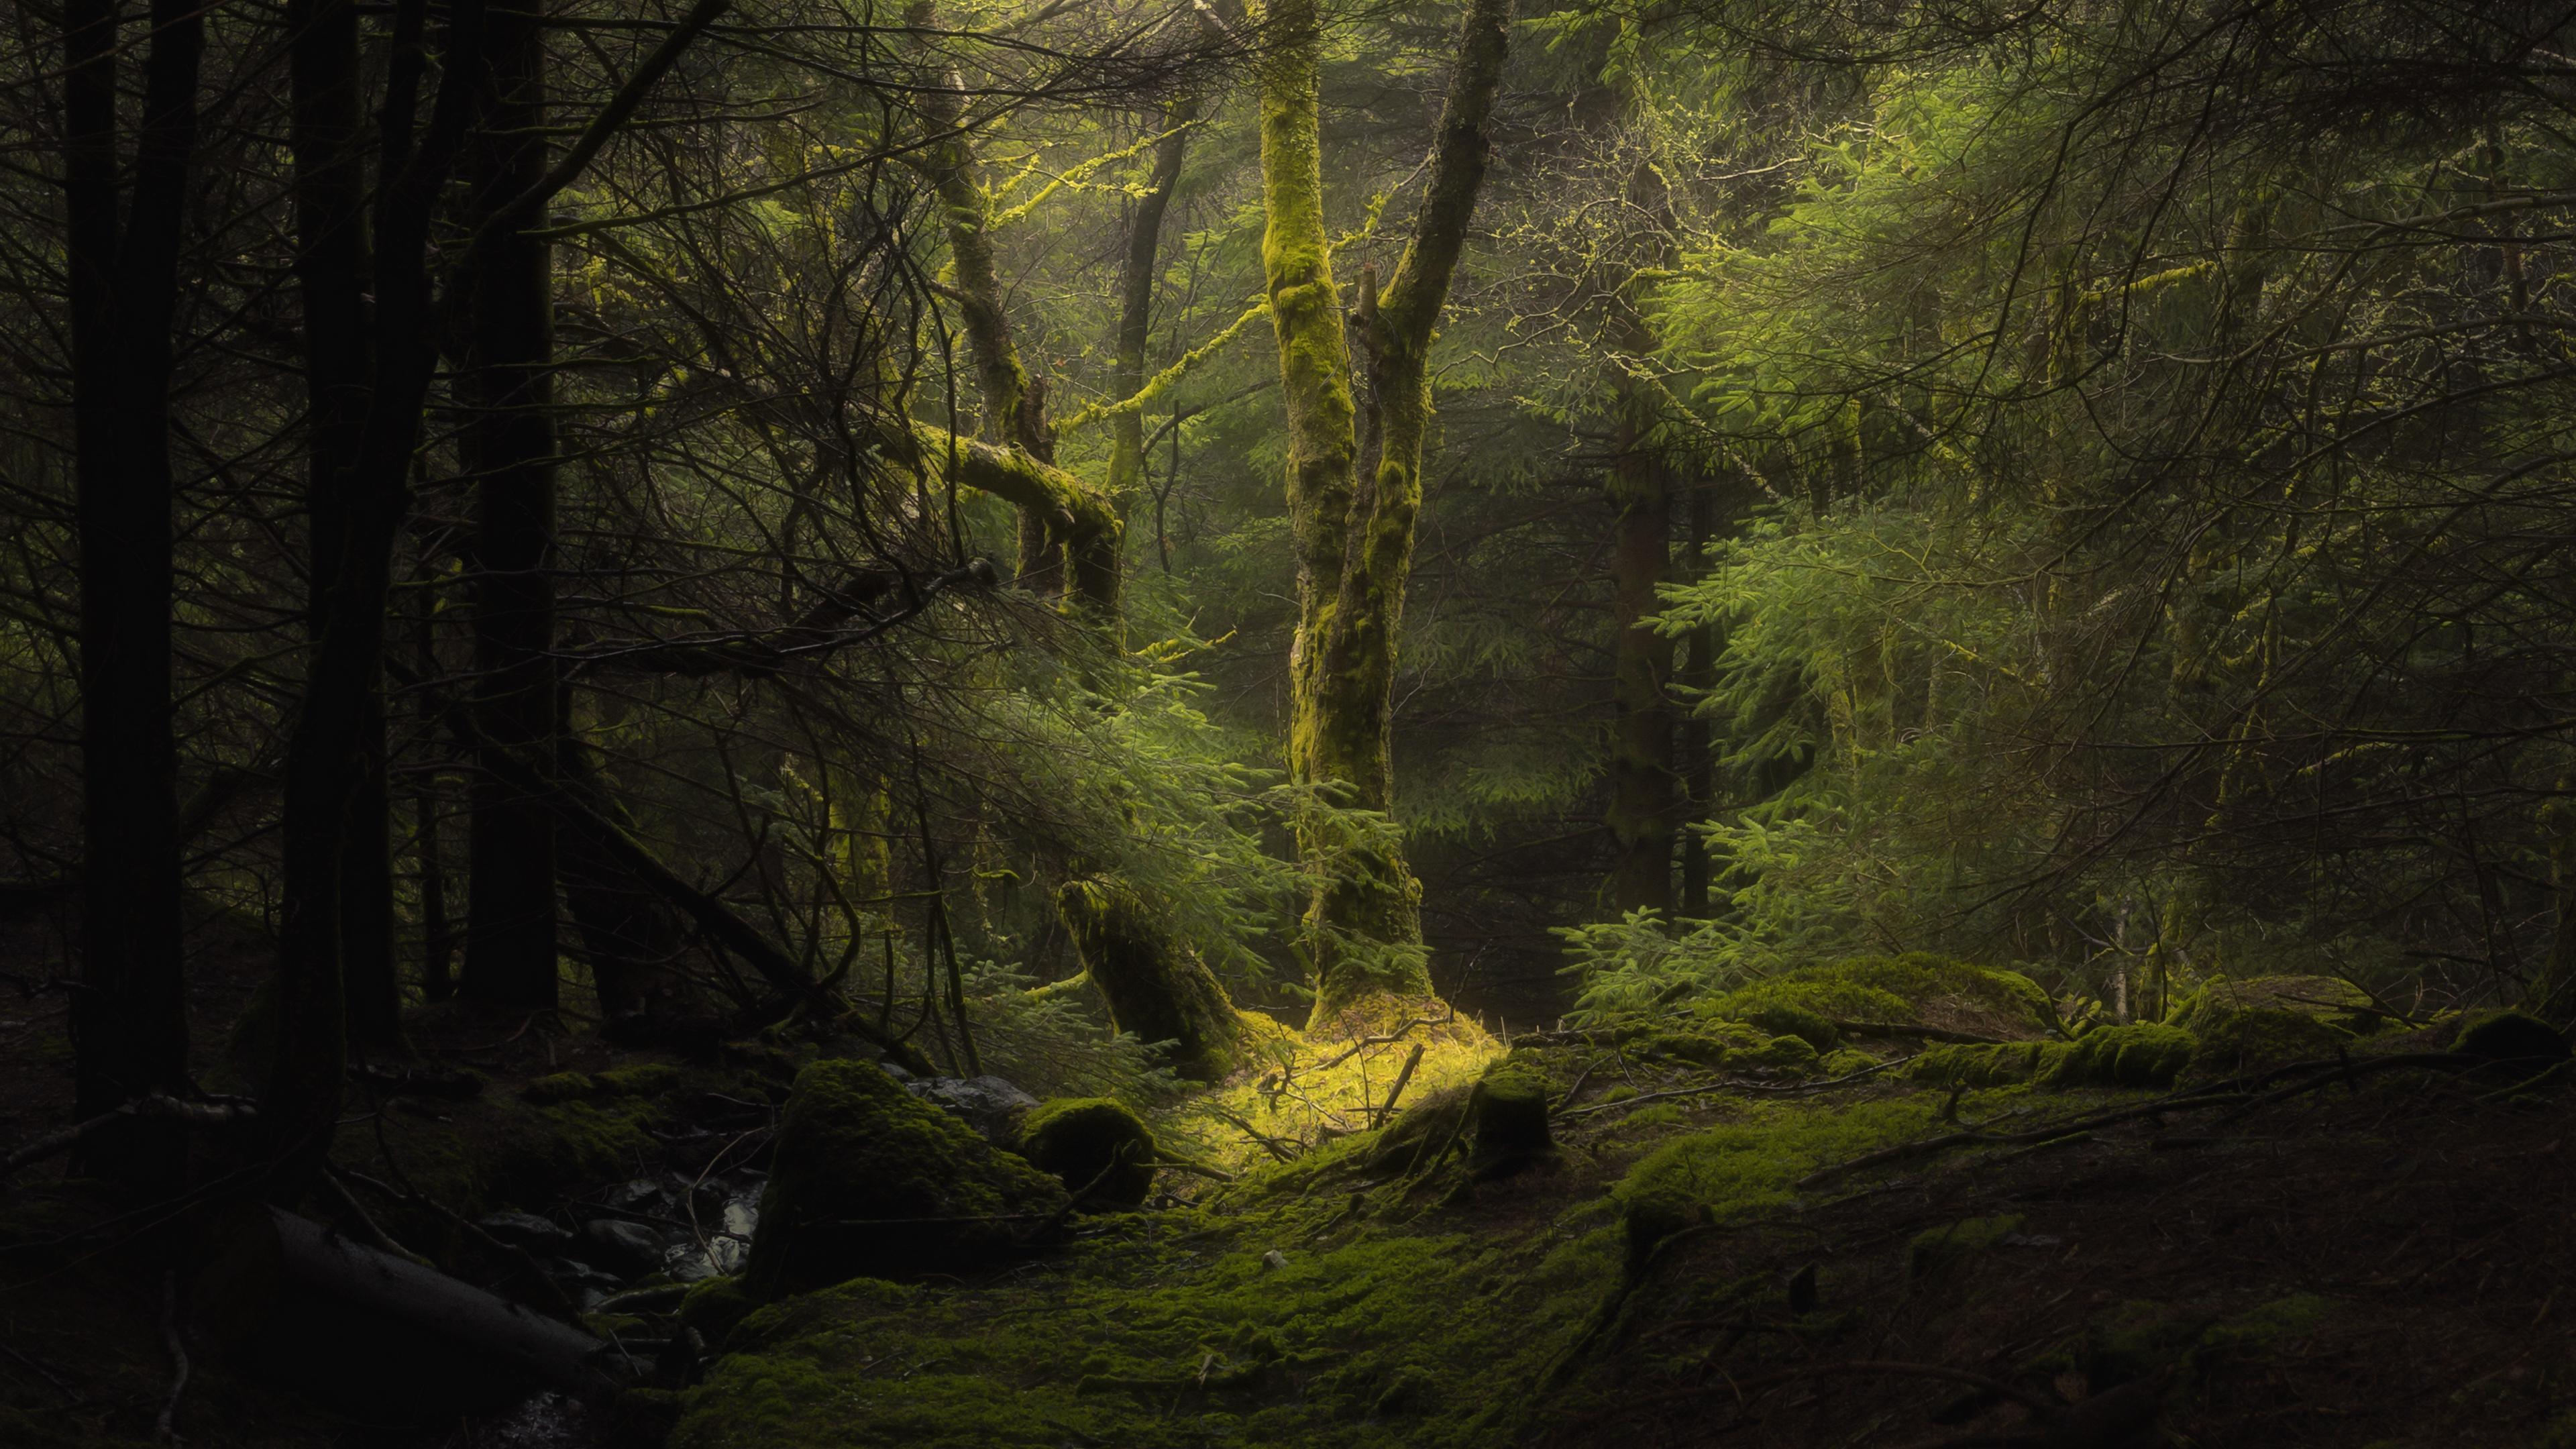 лес, туман, деревья, ветки, мох, 4k обои